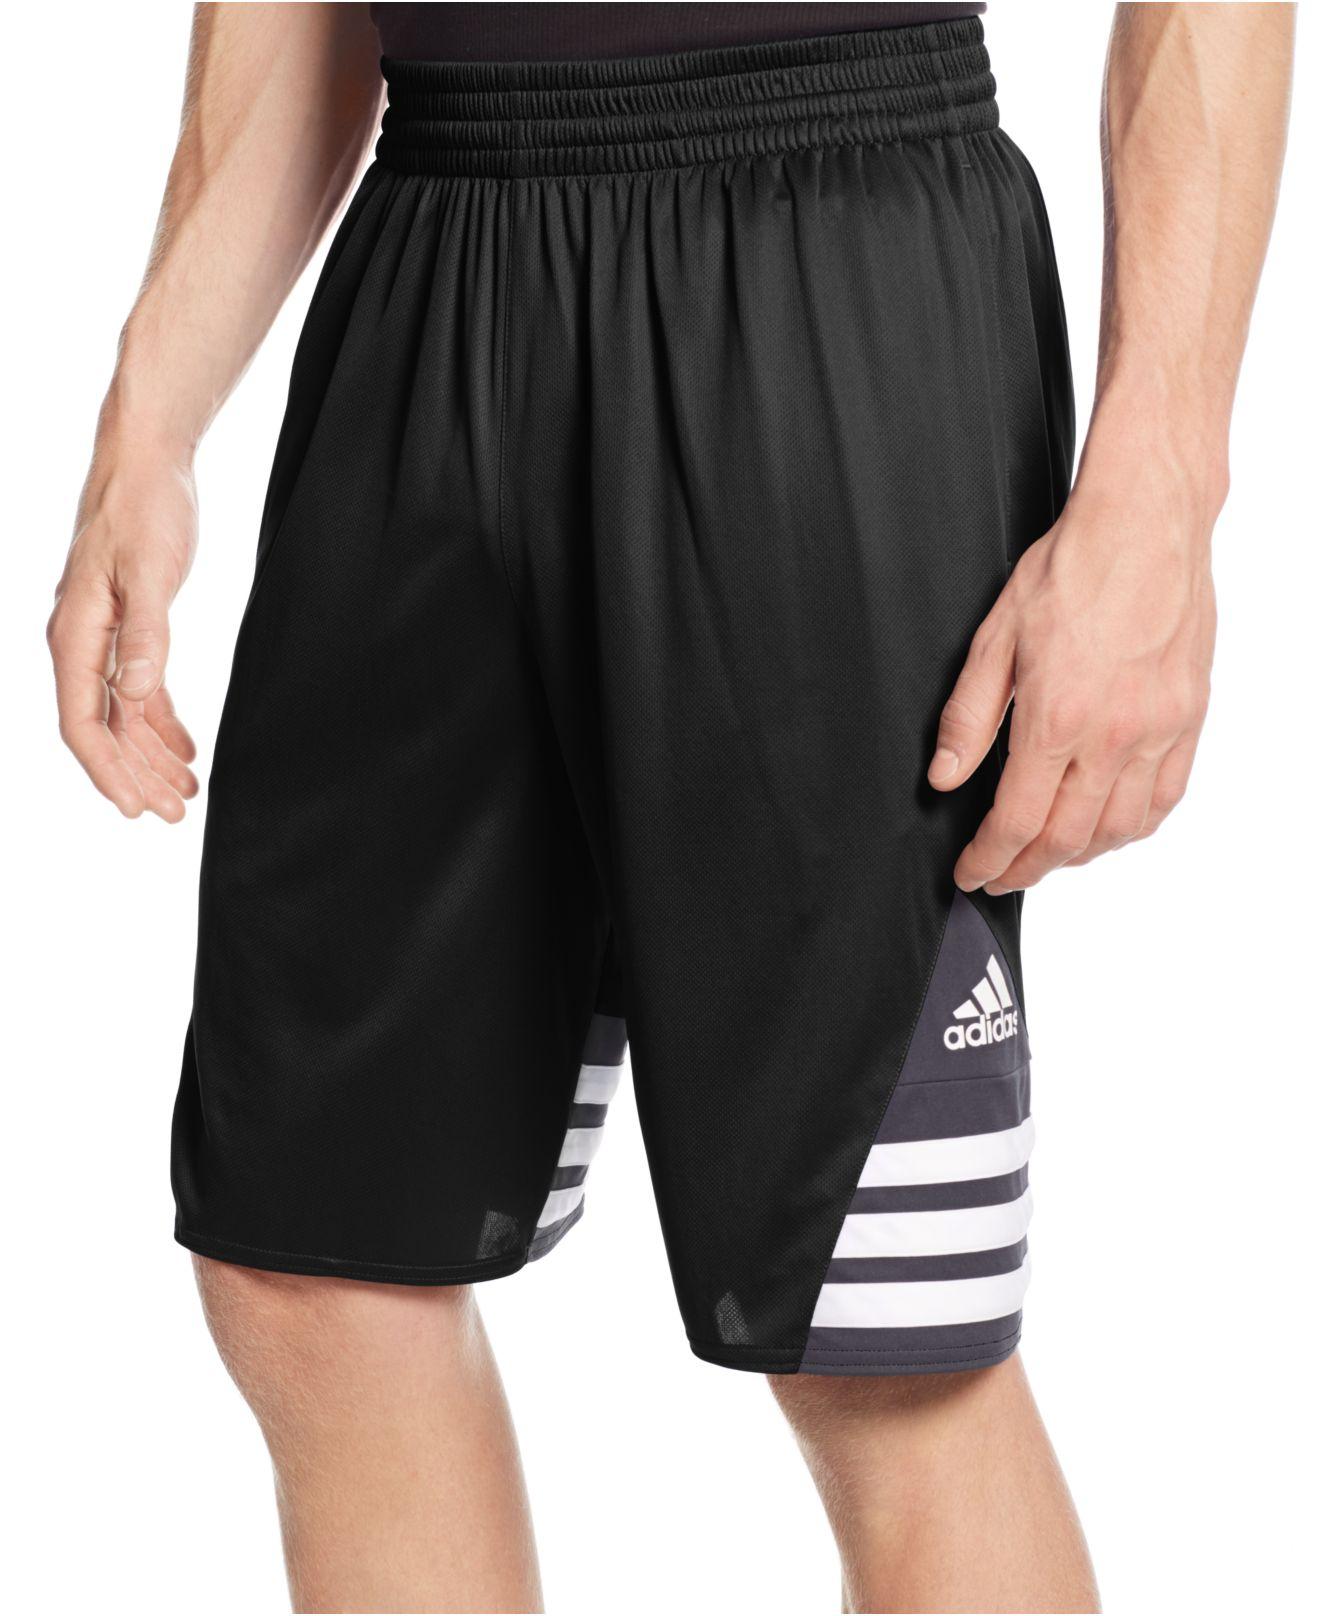 Lyst - Adidas Superstar 2.0 Basketball Shorts in Black for Men